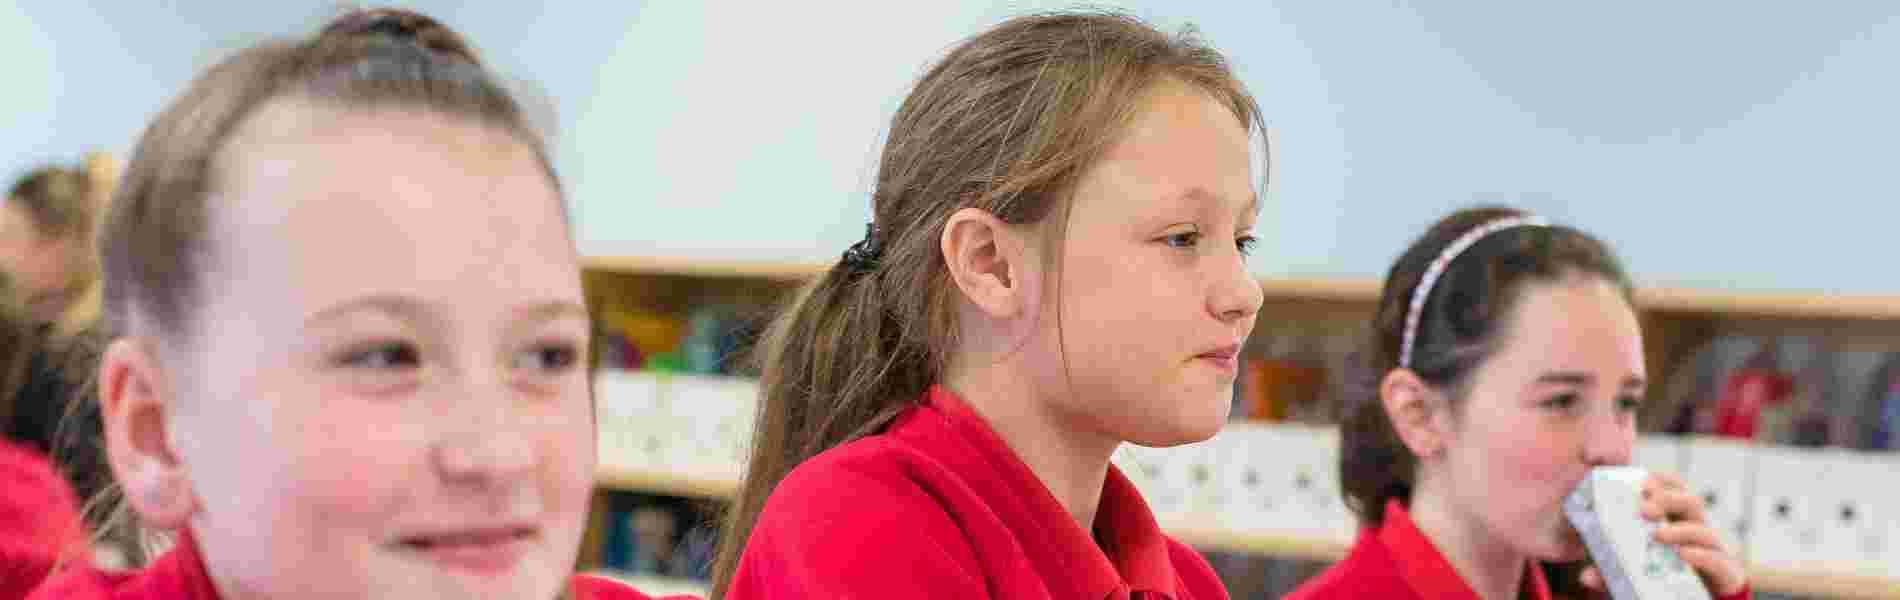 Moorside Community Primary School